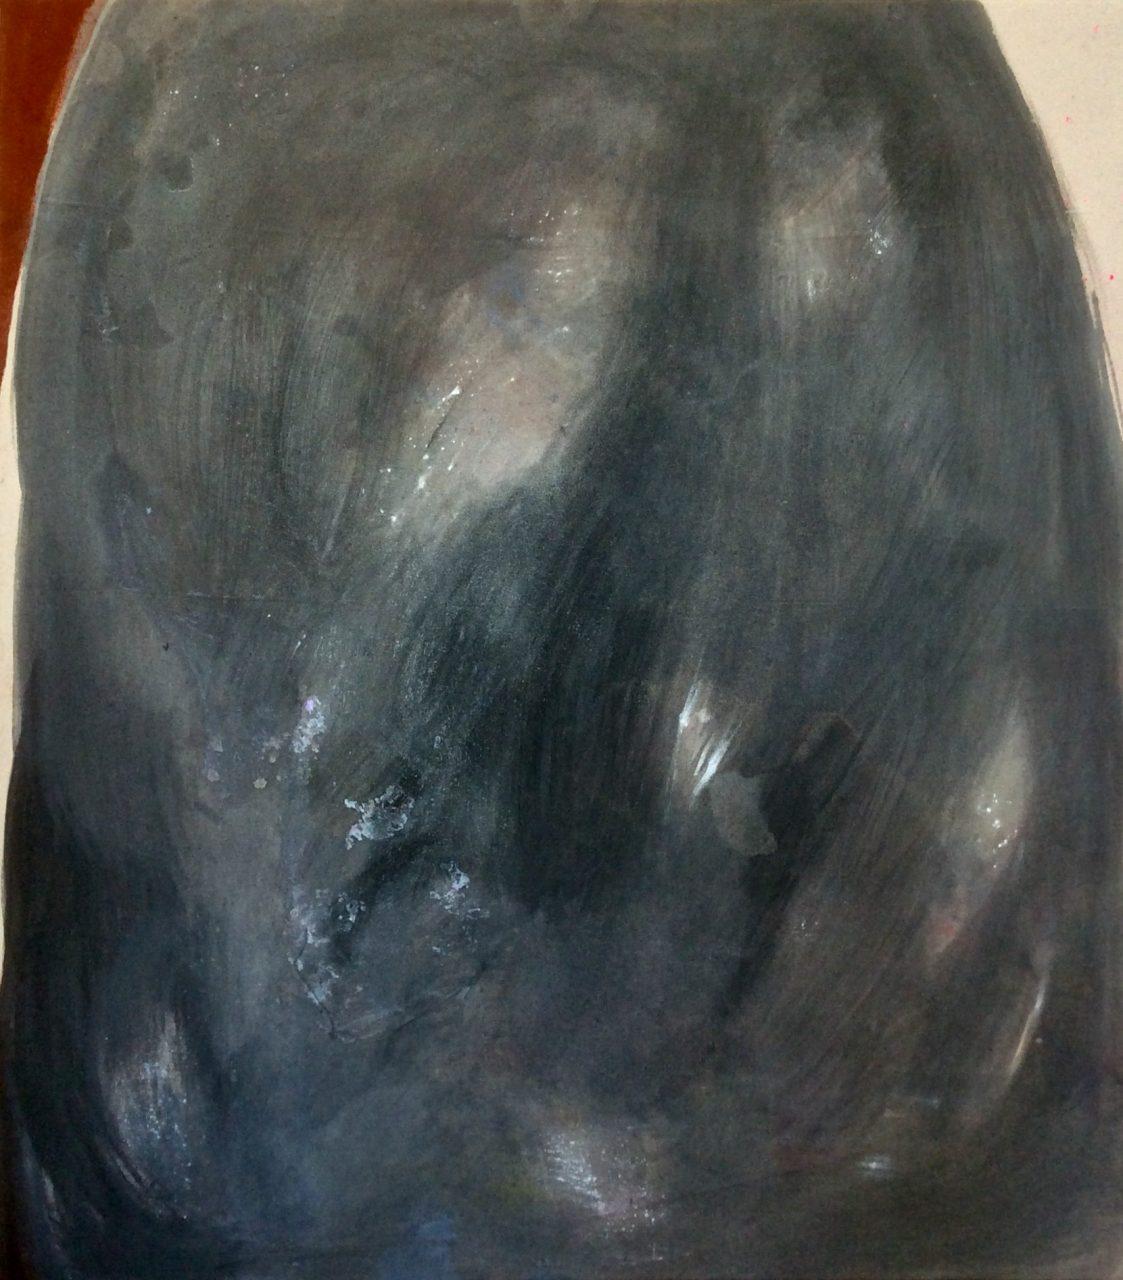 Ghostworld, 85 x 75 cm, 2017